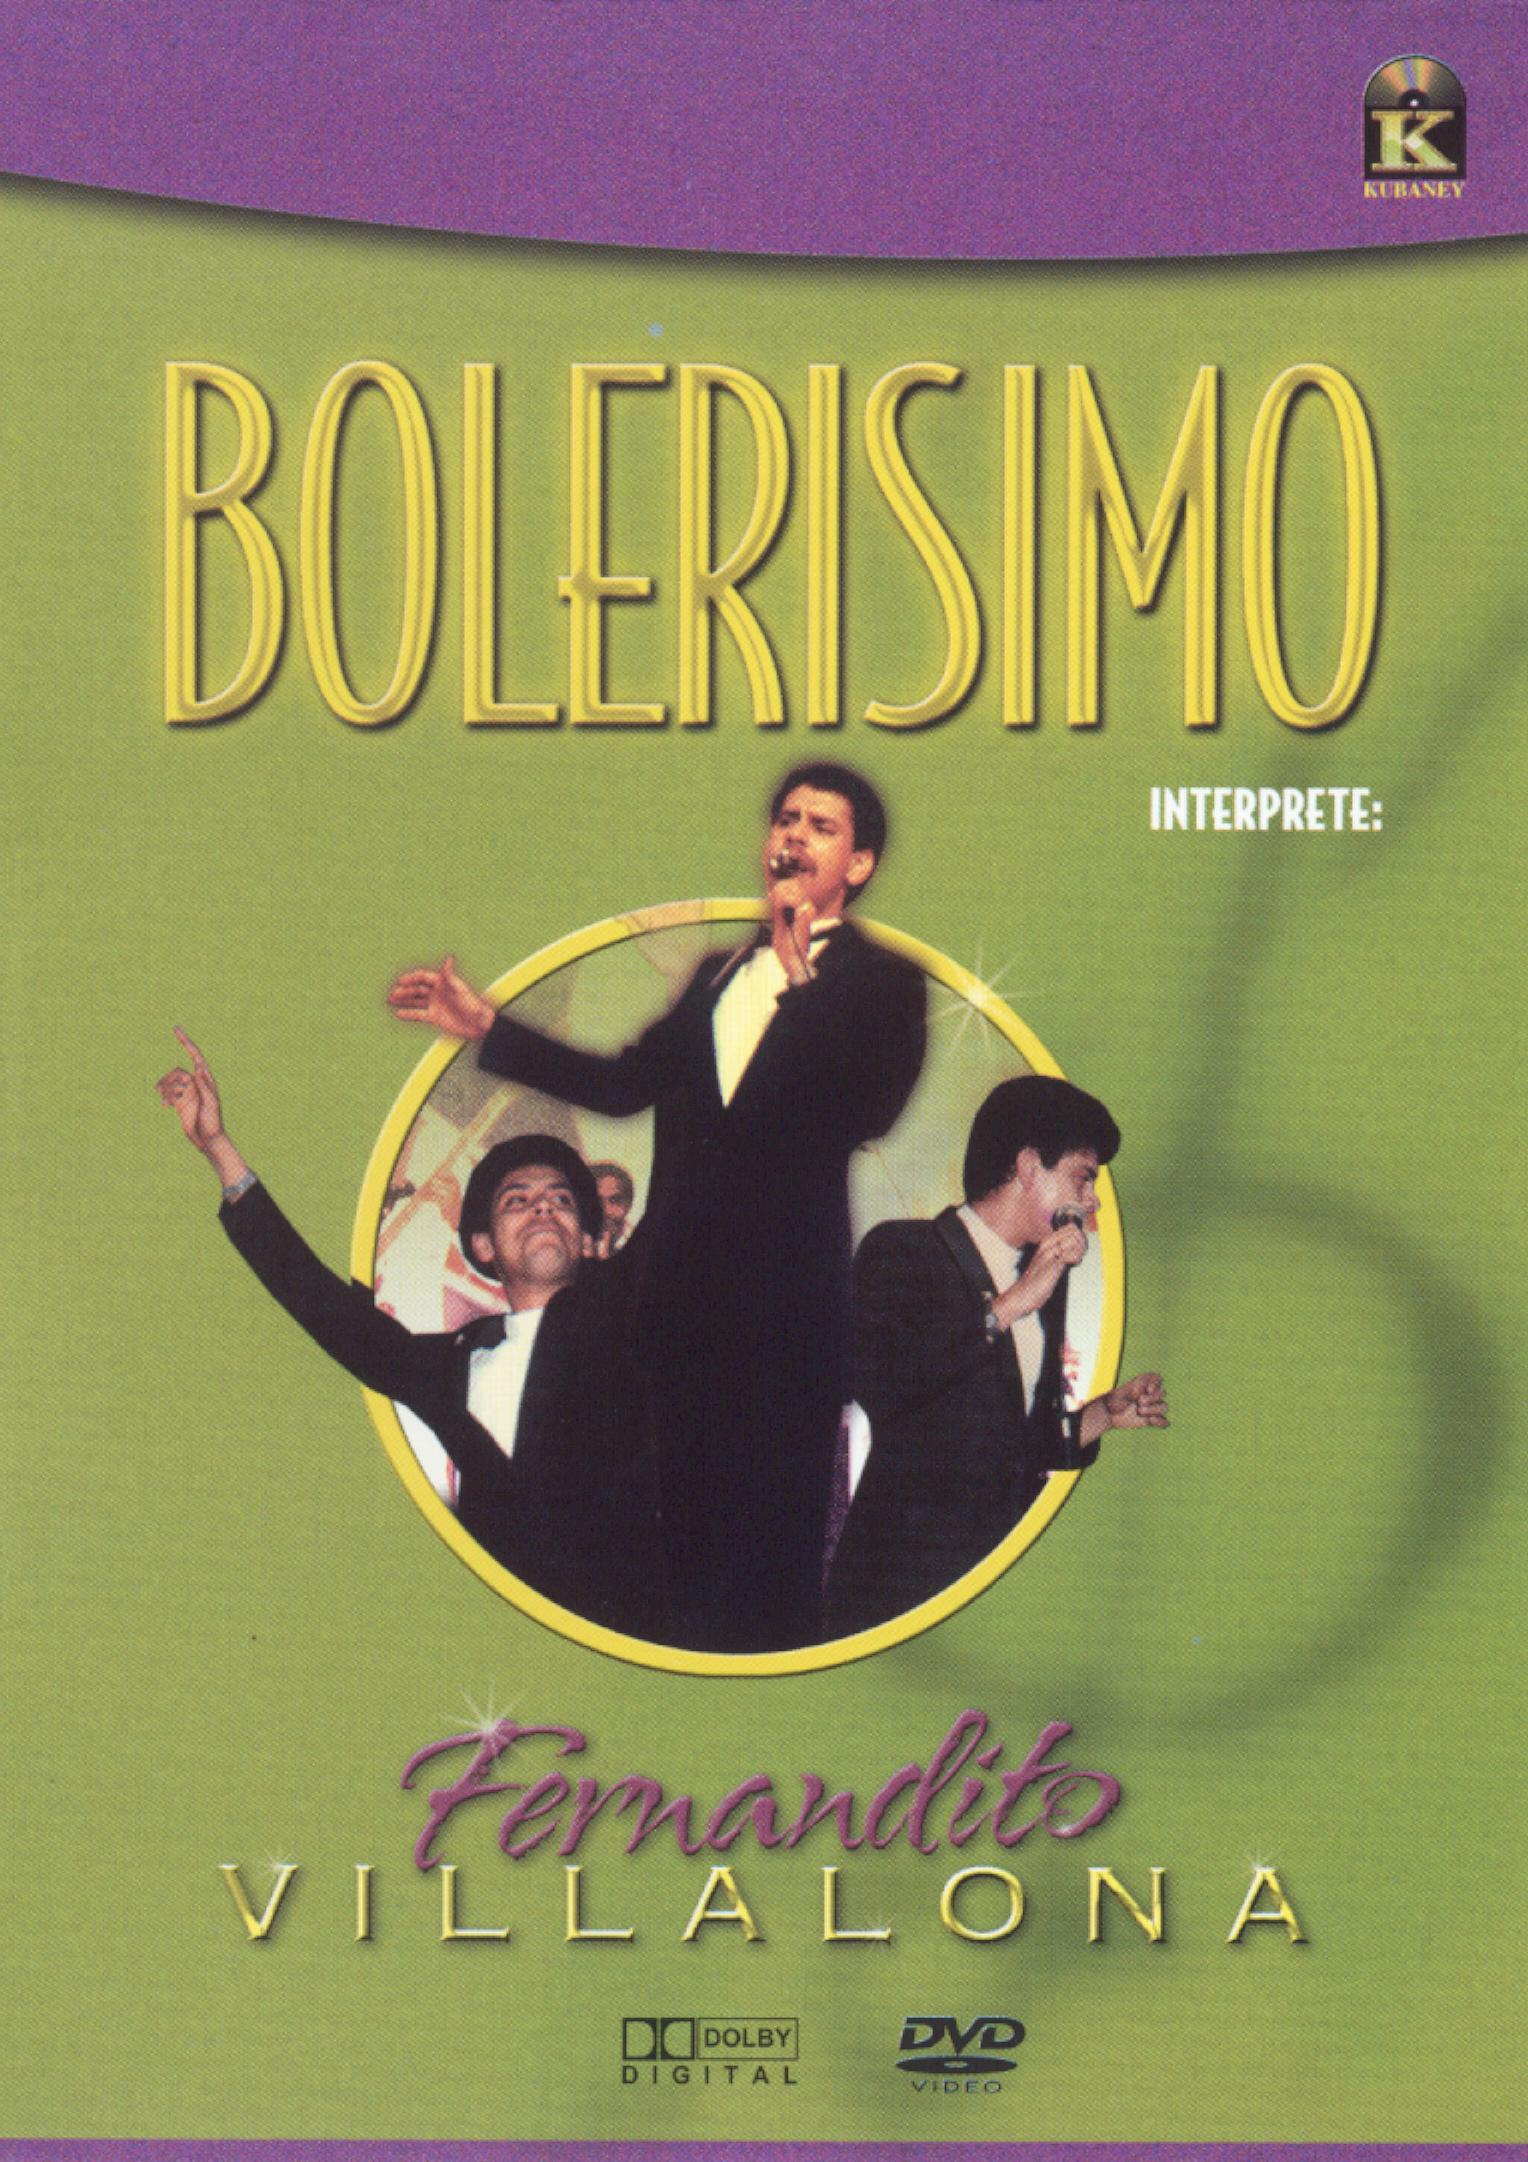 Fernandito Villalona: Bolerisimo